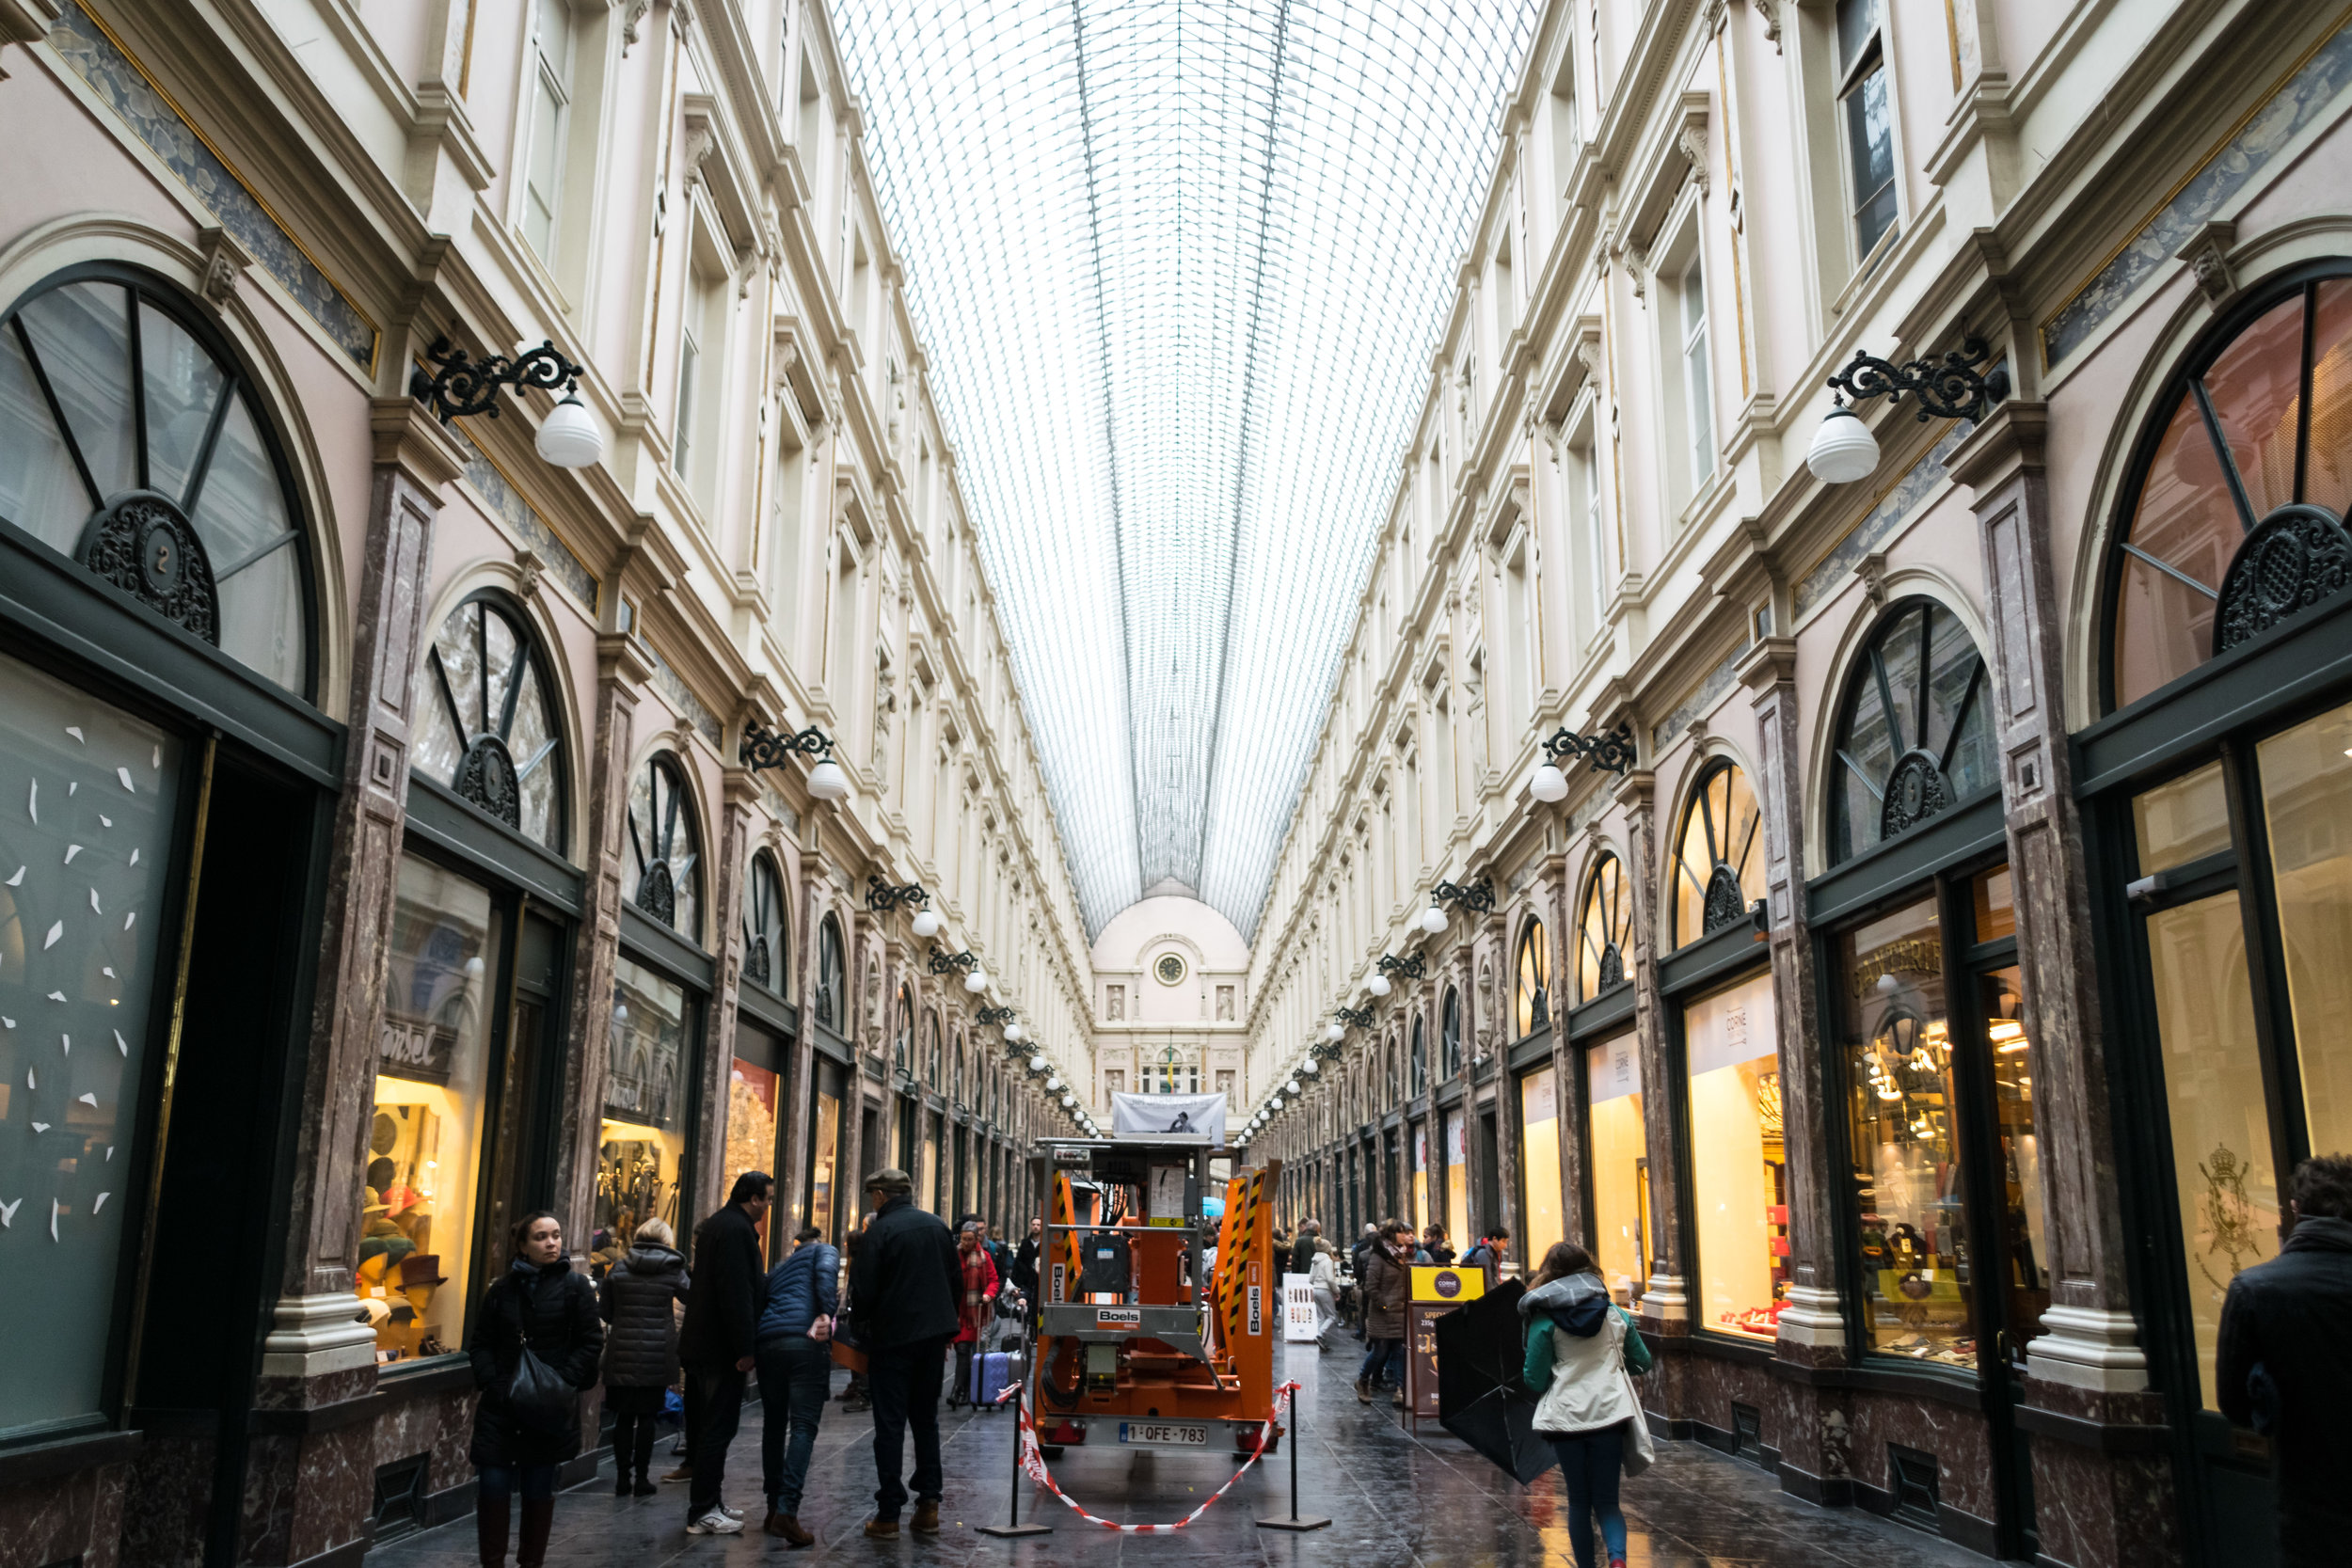 the 19th-century shopping arcade Galeries Royales Saint-Hubert